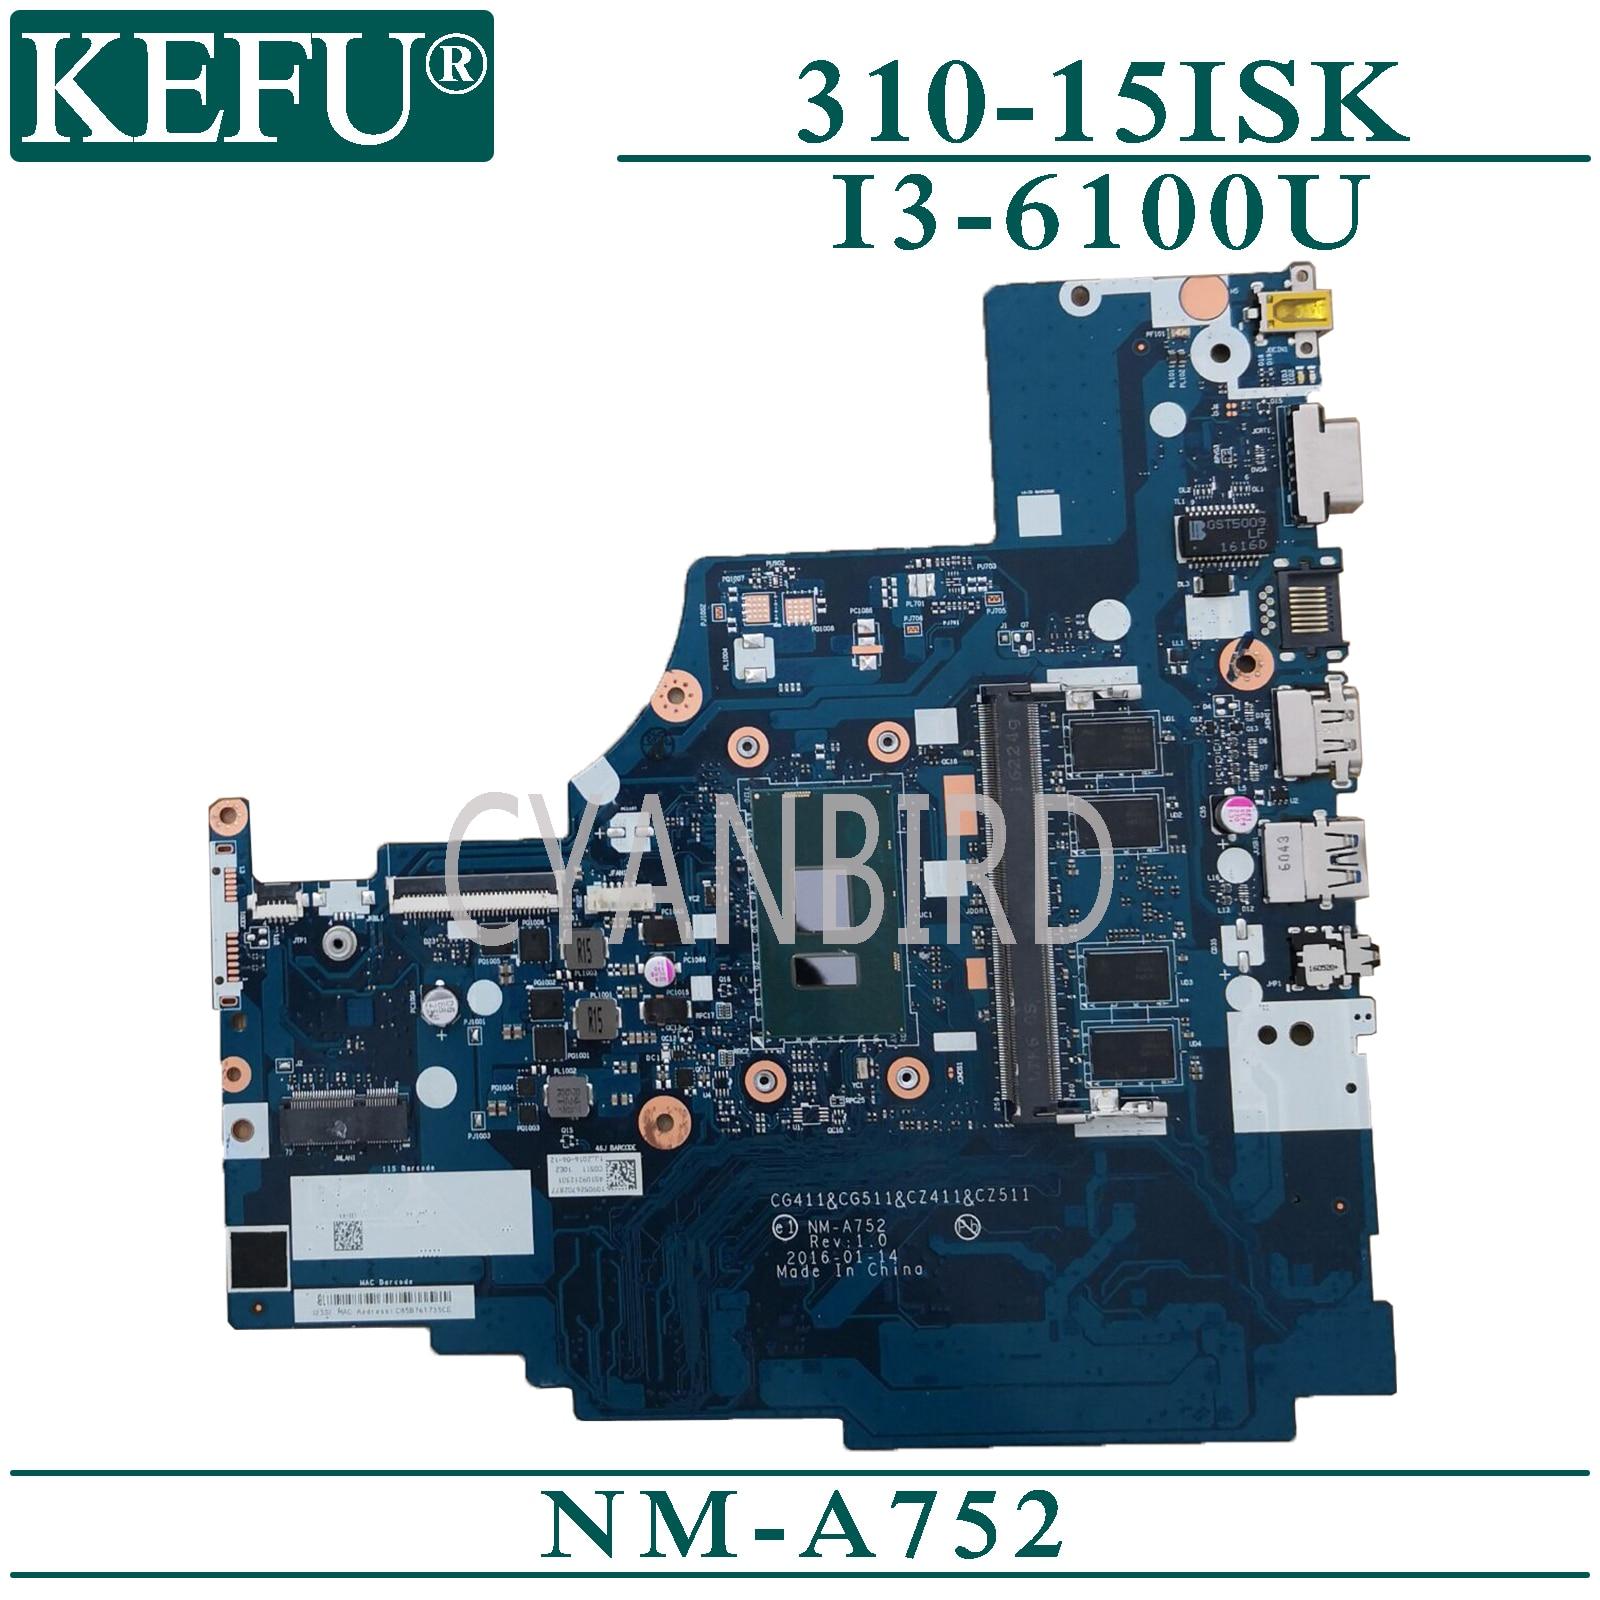 KEFU NM-A752 اللوحة الأصلية لينوفو 310-15ISK مع 4GB-RAM I3-6100U/6006U اللوحة المحمول